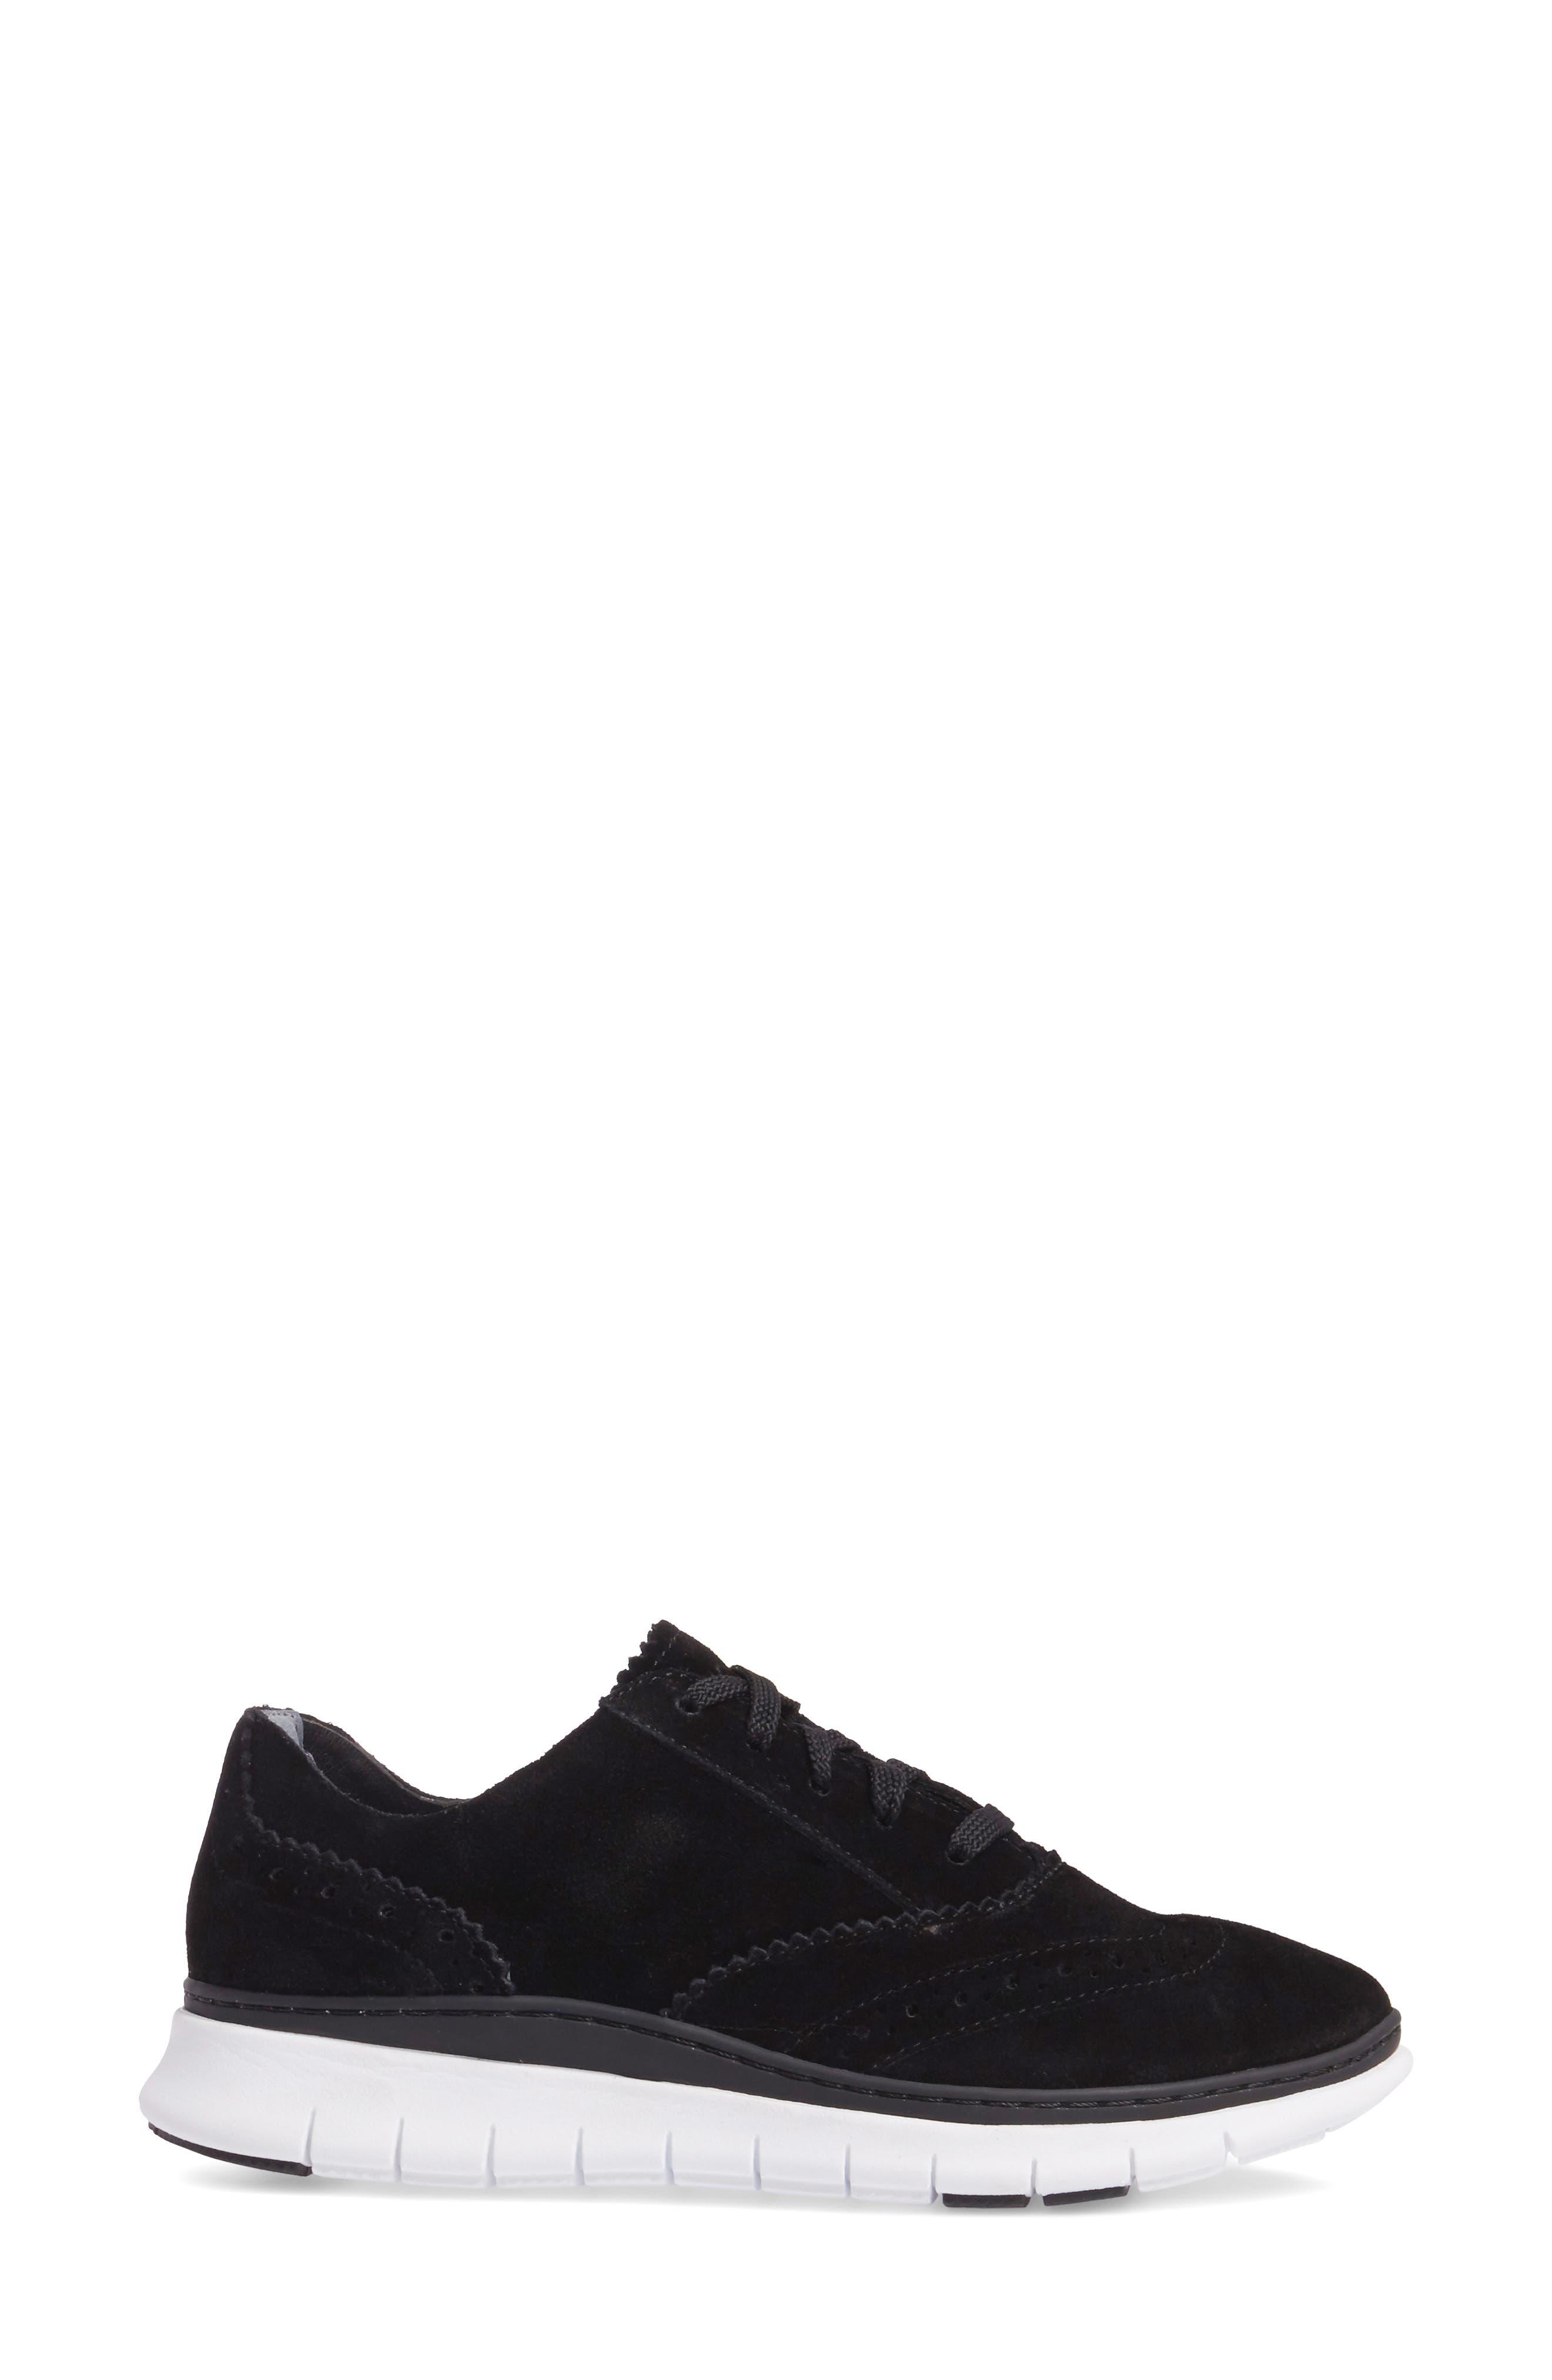 Kenley Sneaker,                             Alternate thumbnail 3, color,                             Black Suede